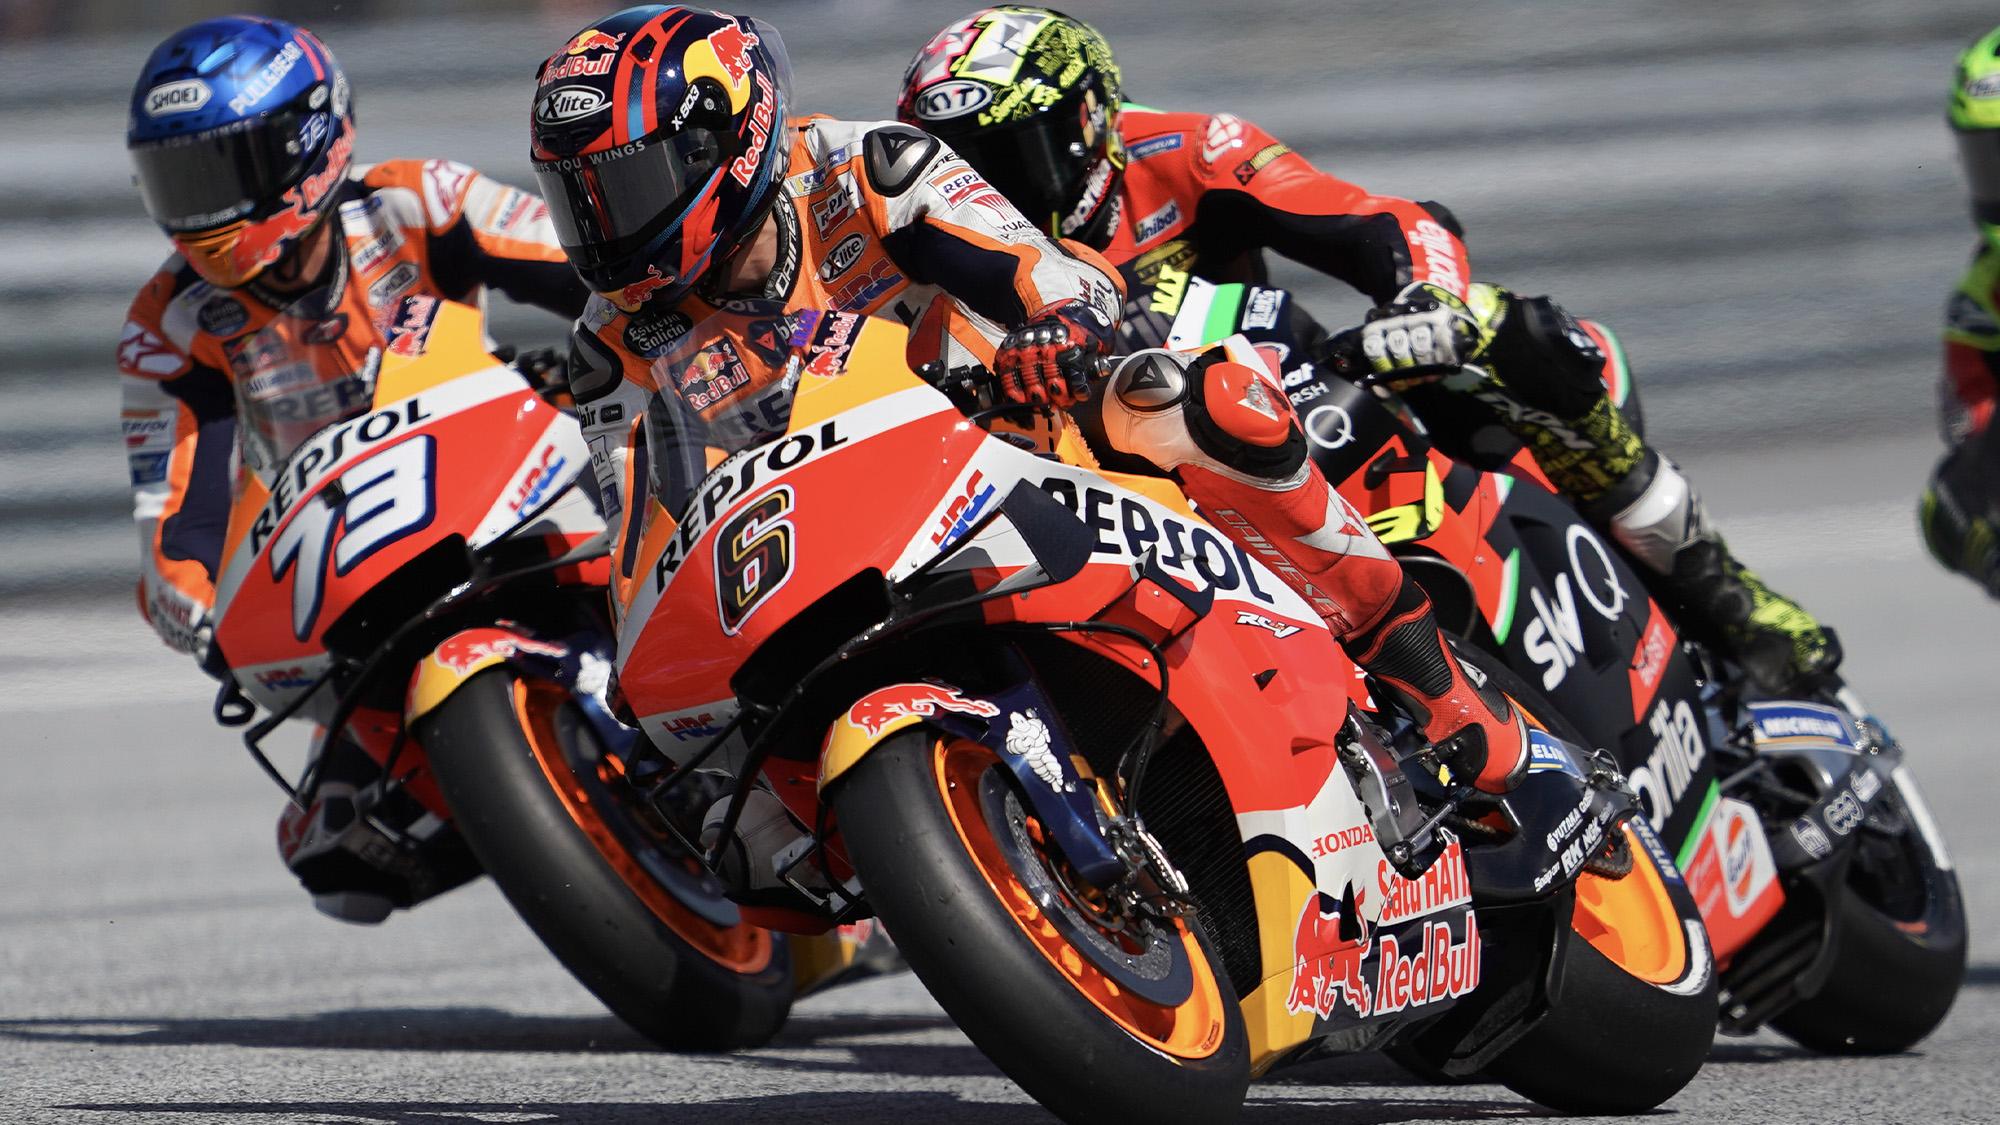 Honda riders Alex Marquez and Stefan Bradl at the 2020 MotoGP Austrian Grand Prix